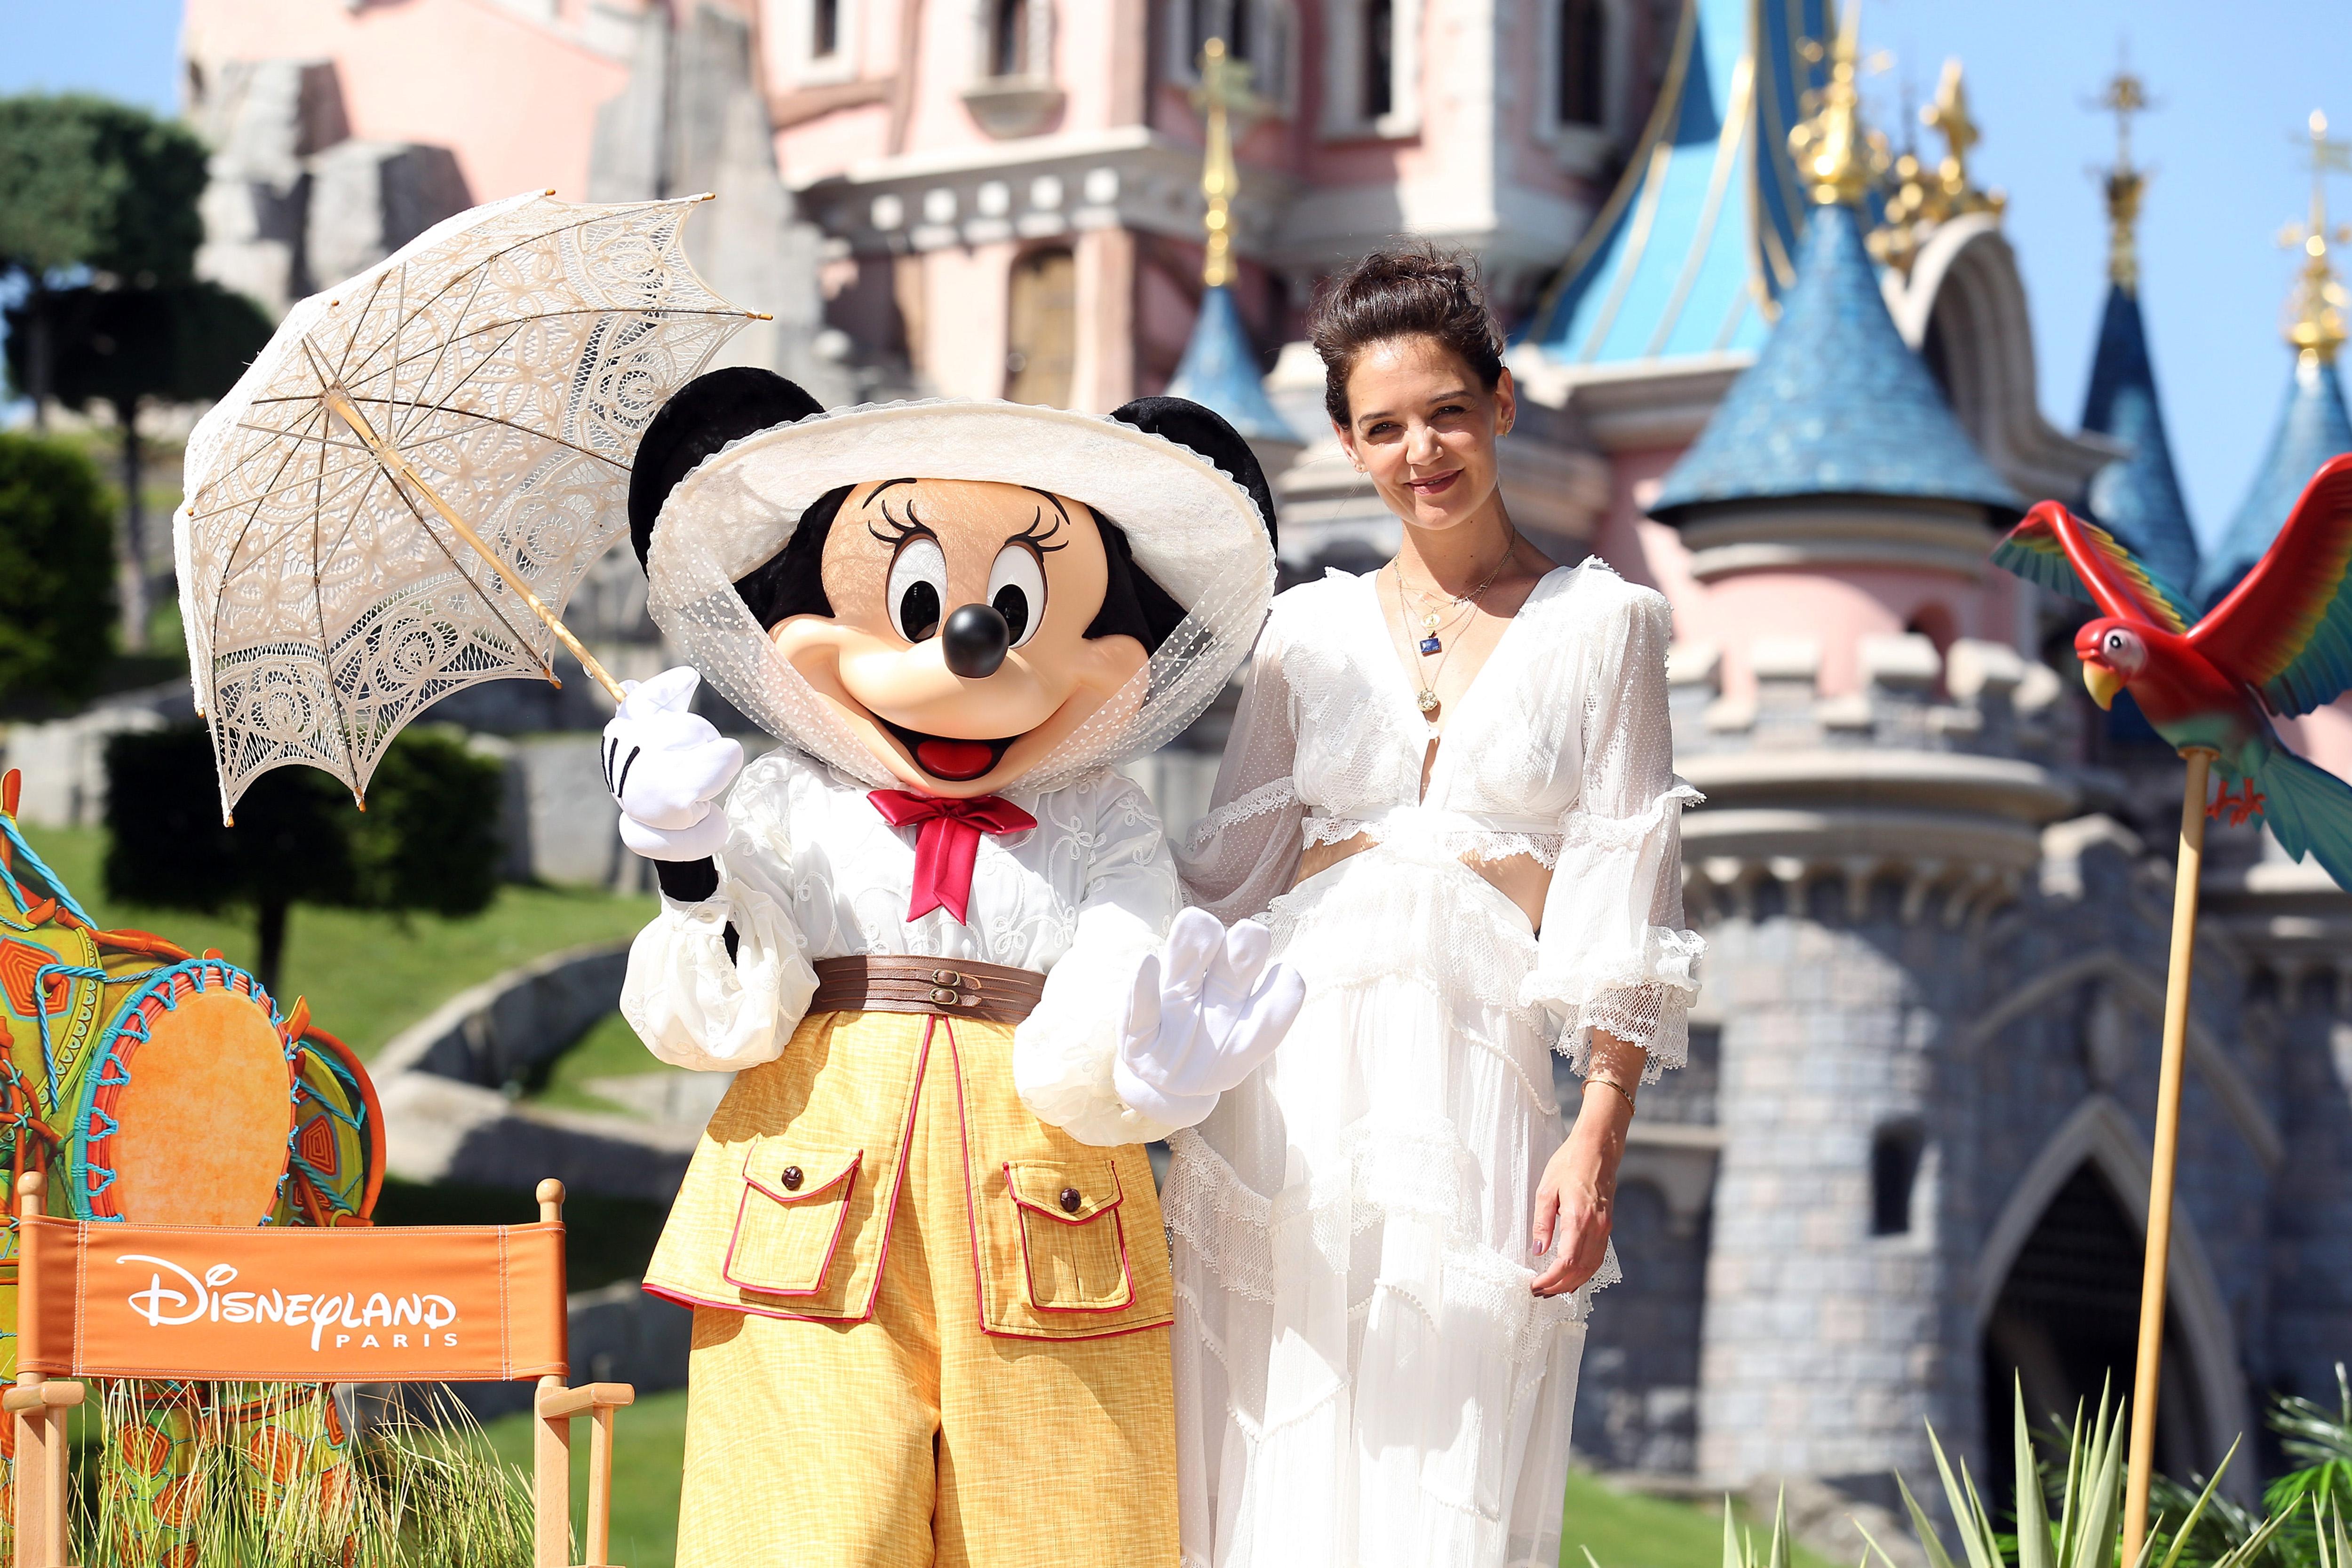 Katie Holmes Zimmerman white dress at Disneyland Paris